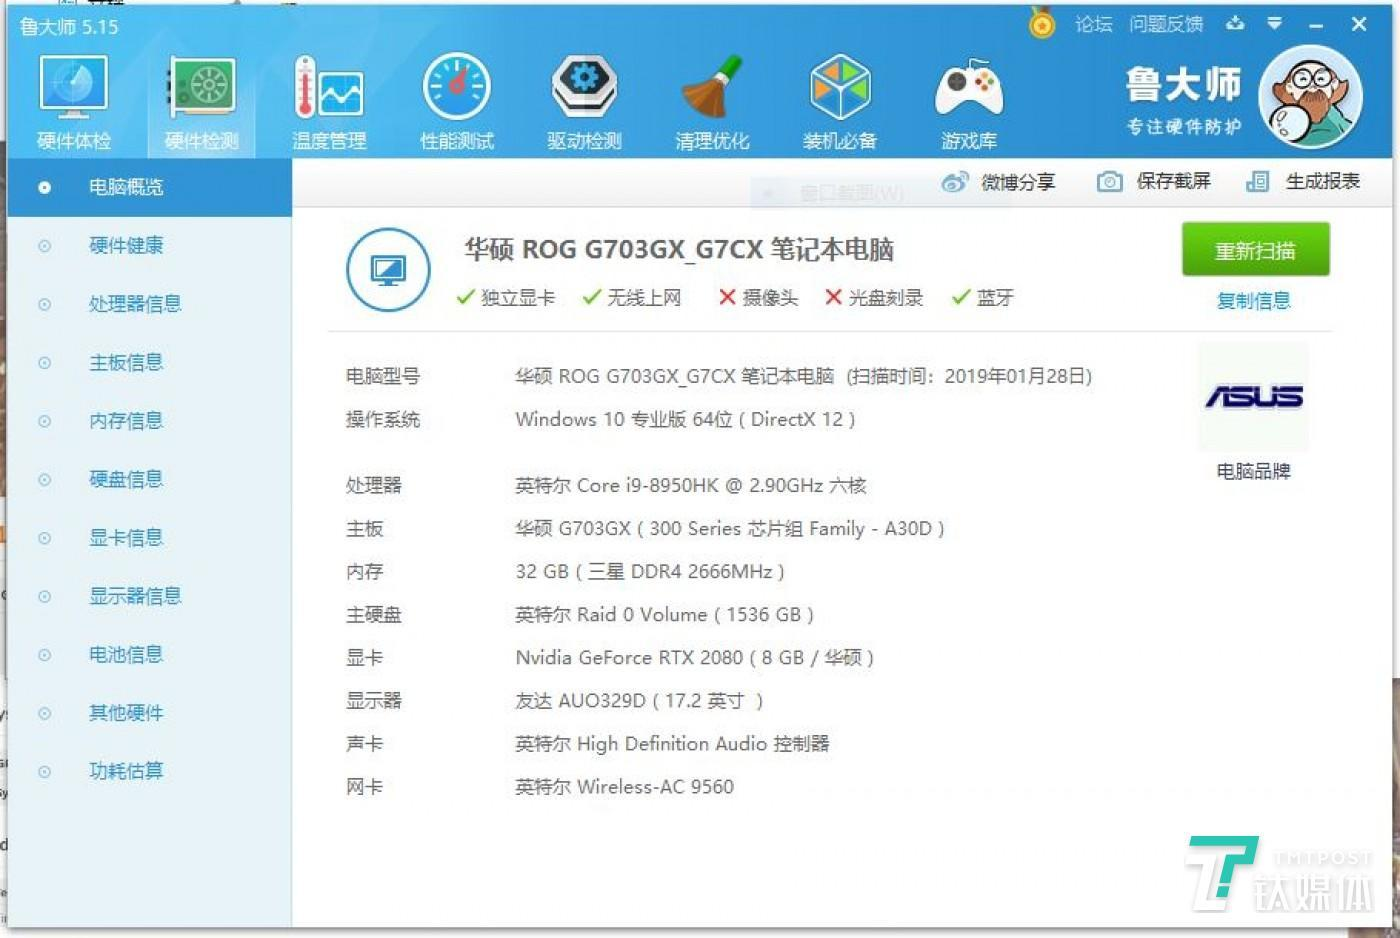 i7-8750H 处理器&NVIDIA GeForce GTX 1050Ti Max-Q独立显卡